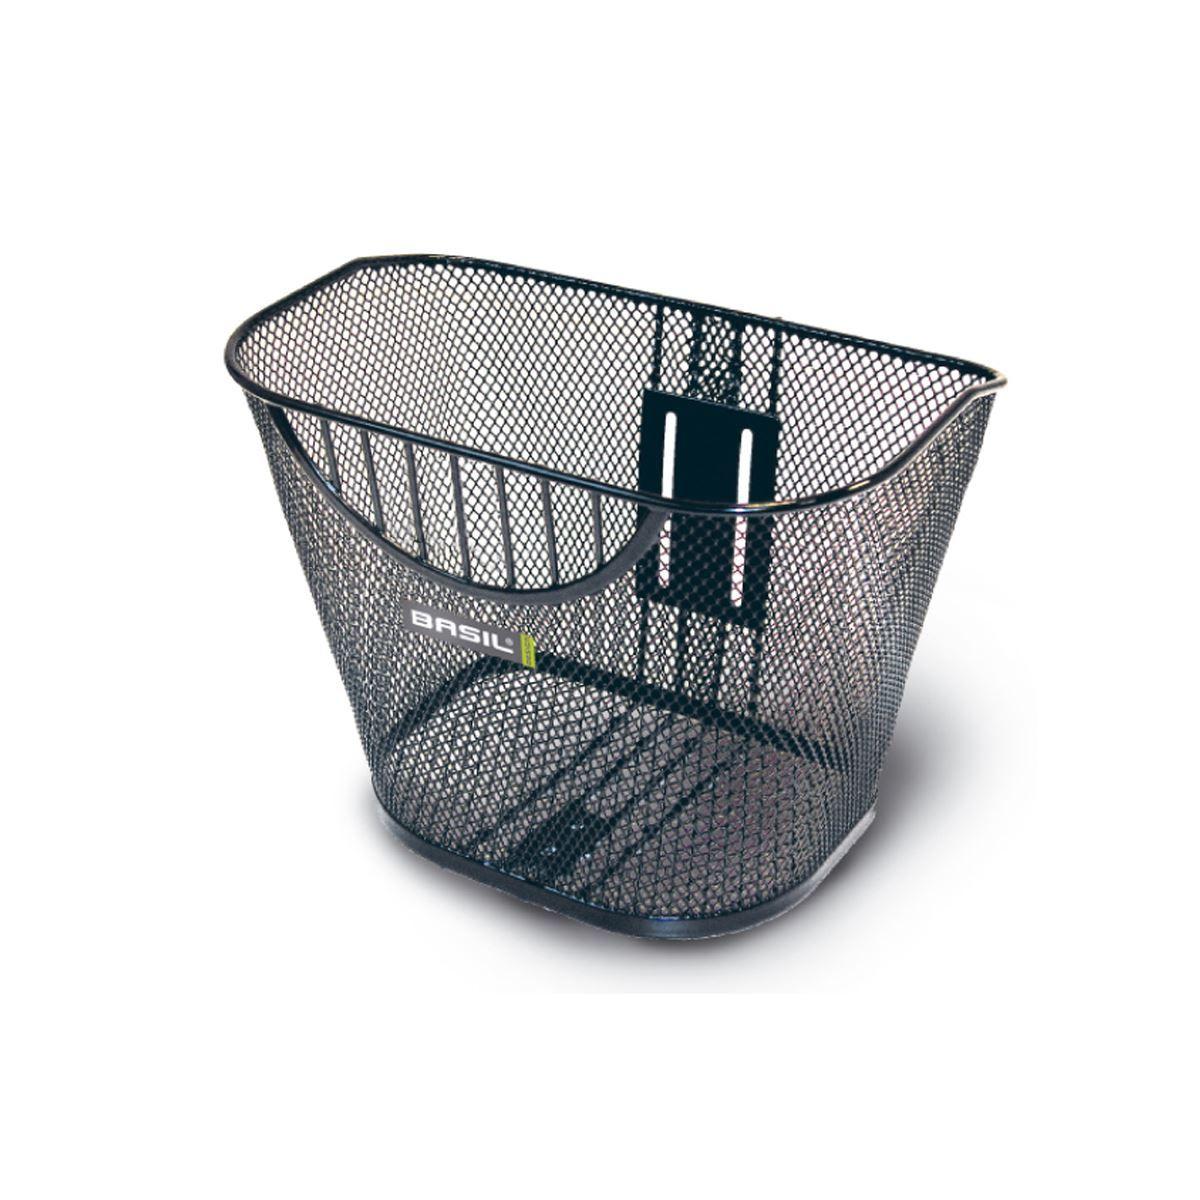 Basil Berlin Luxe Front Mesh Basket Bracket Not Included: